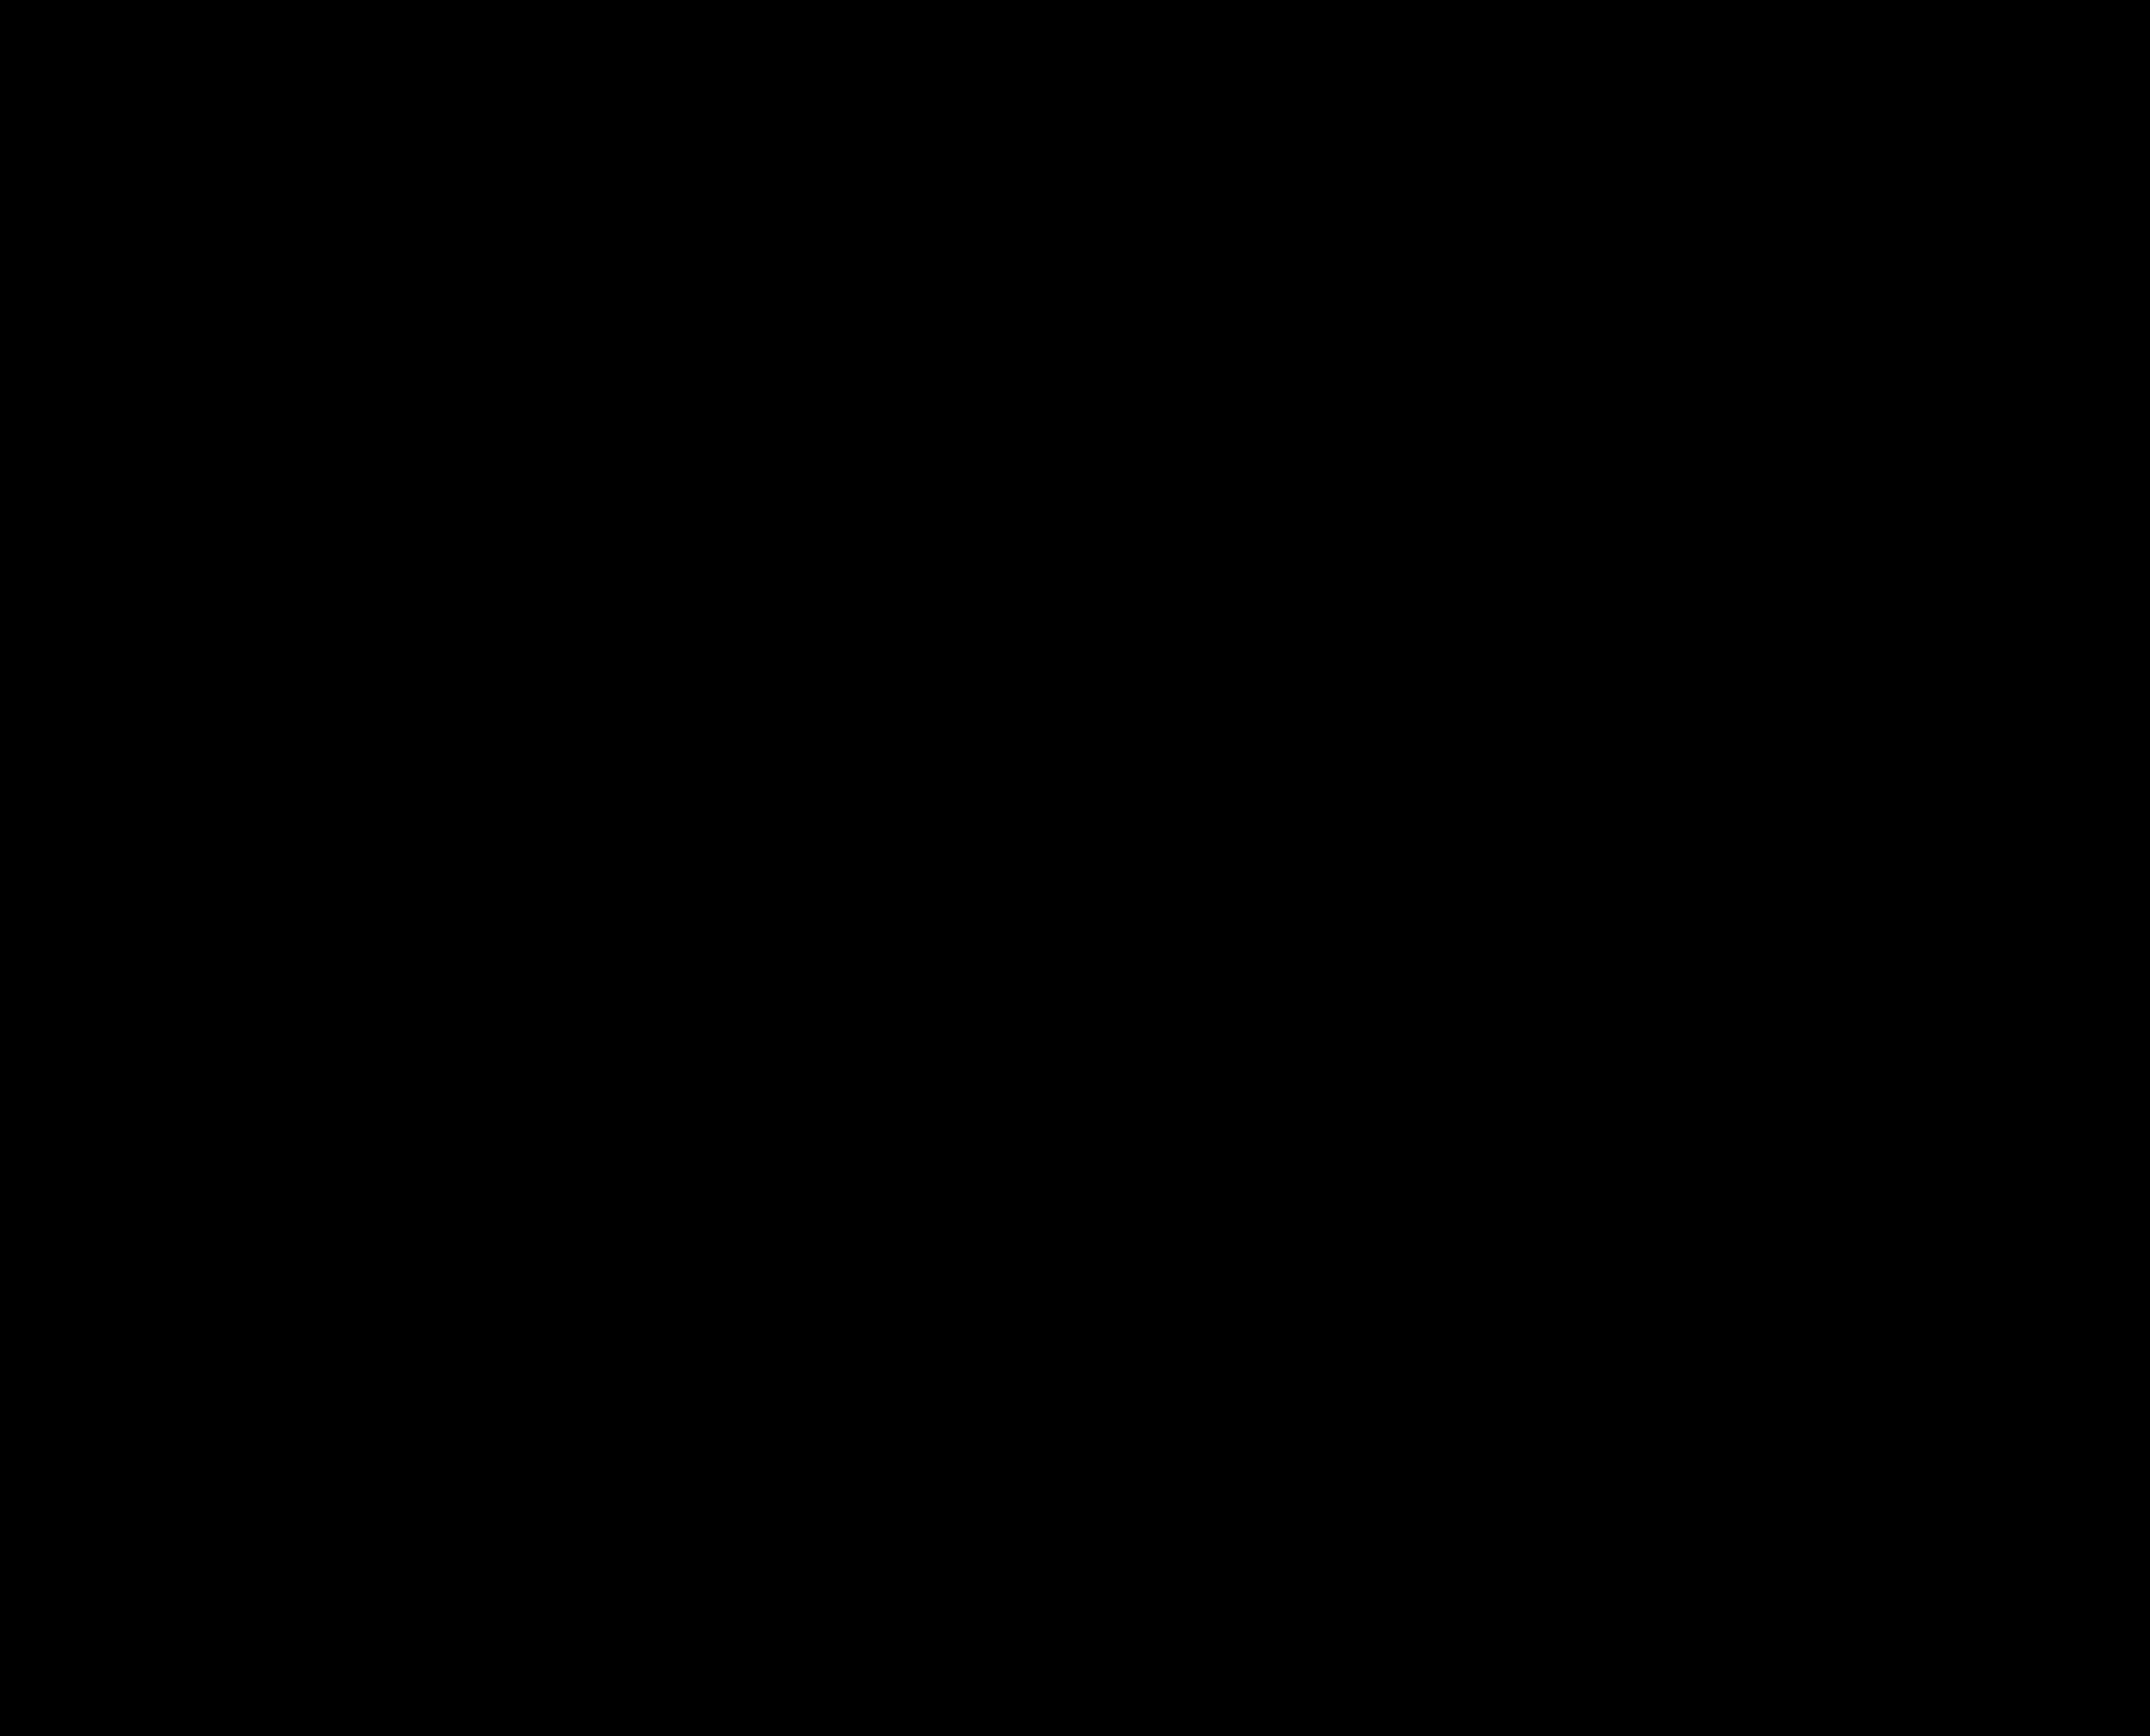 2400x1938 Clipart